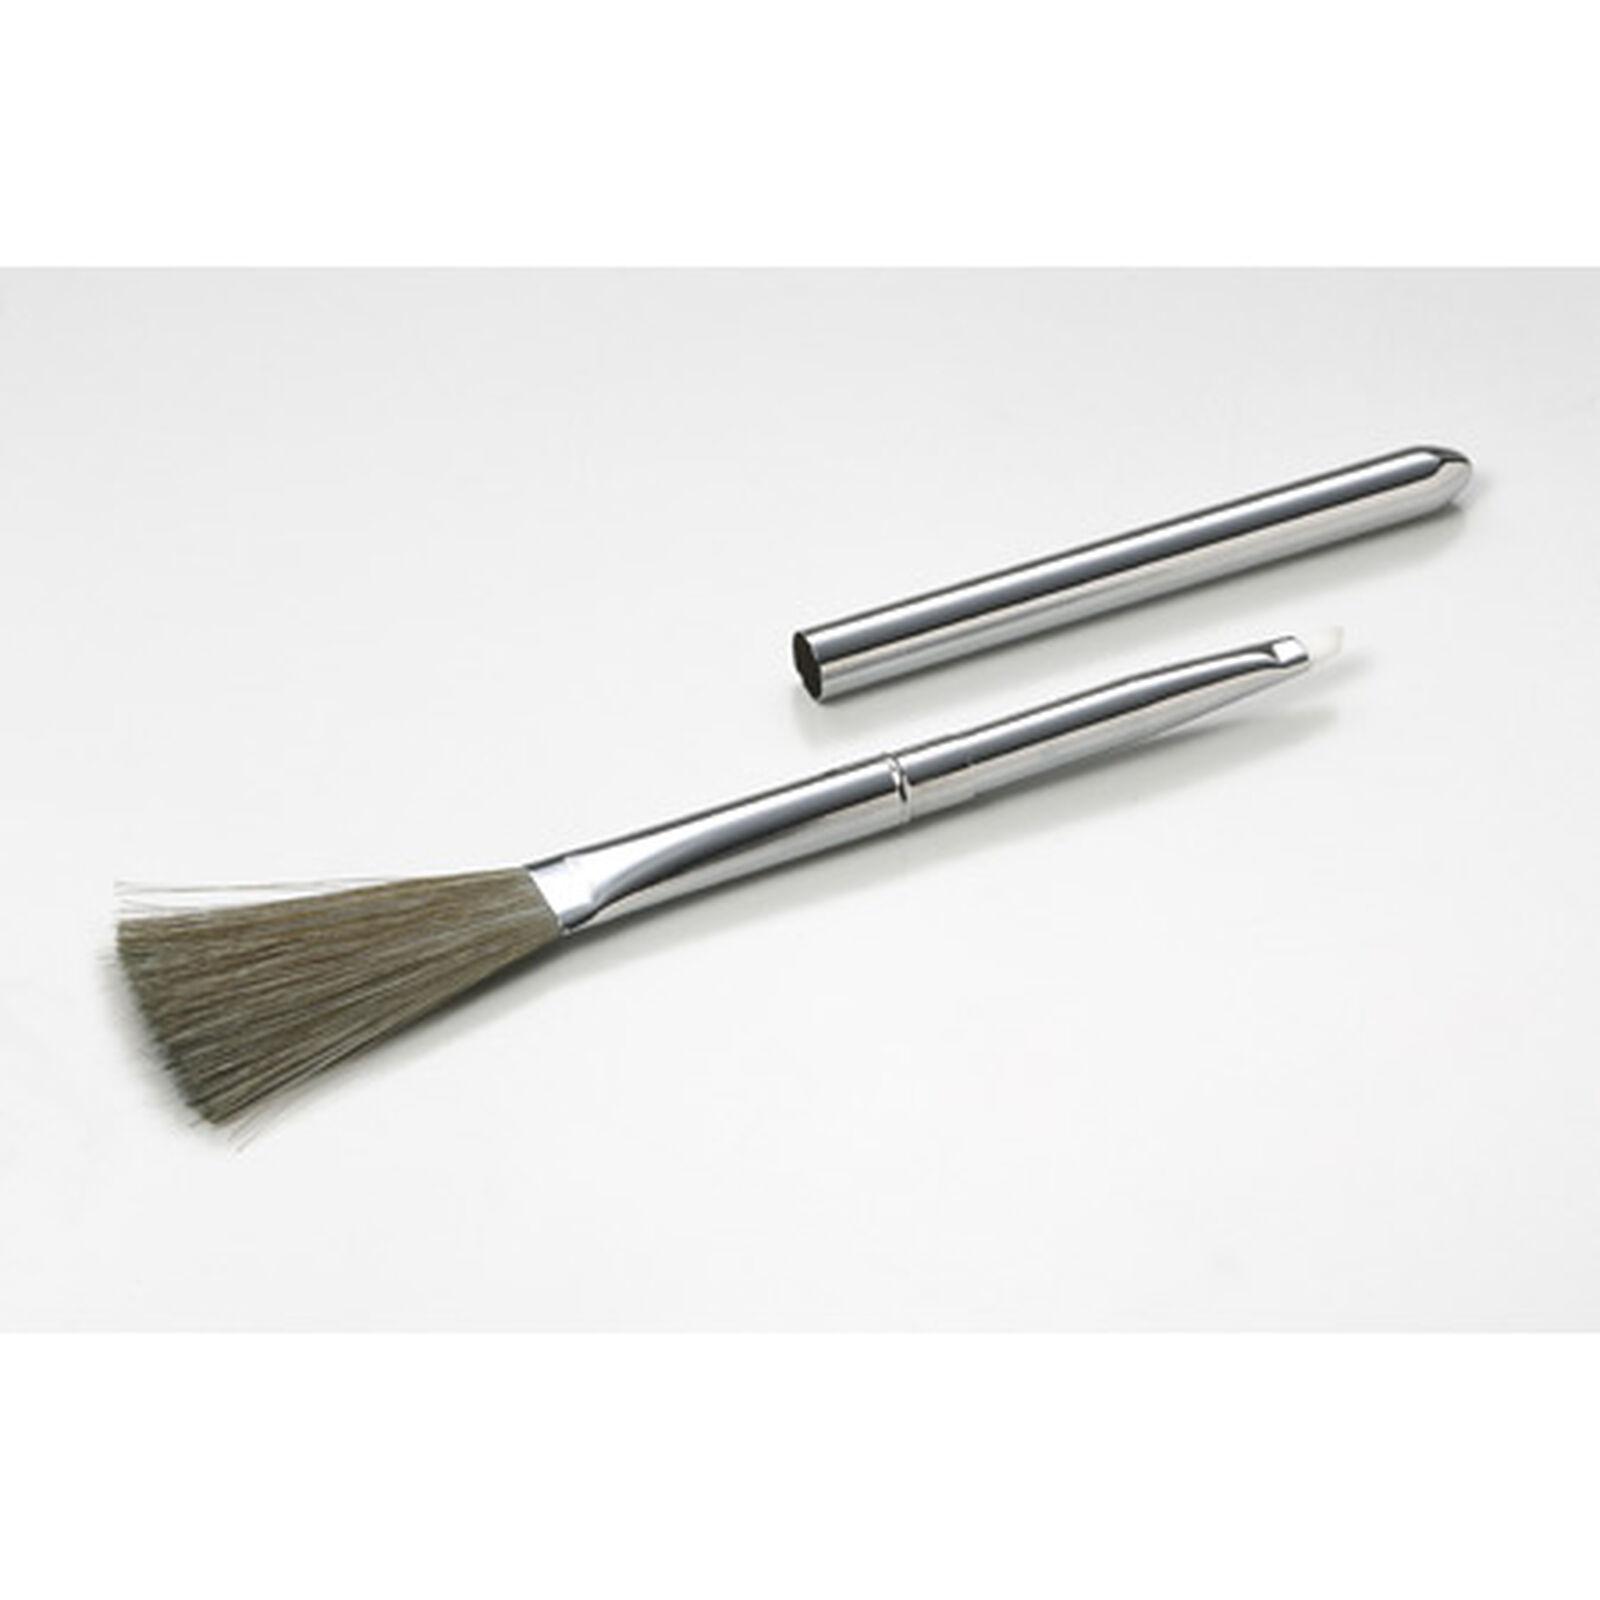 Model Cleaning Brush, Anti Static